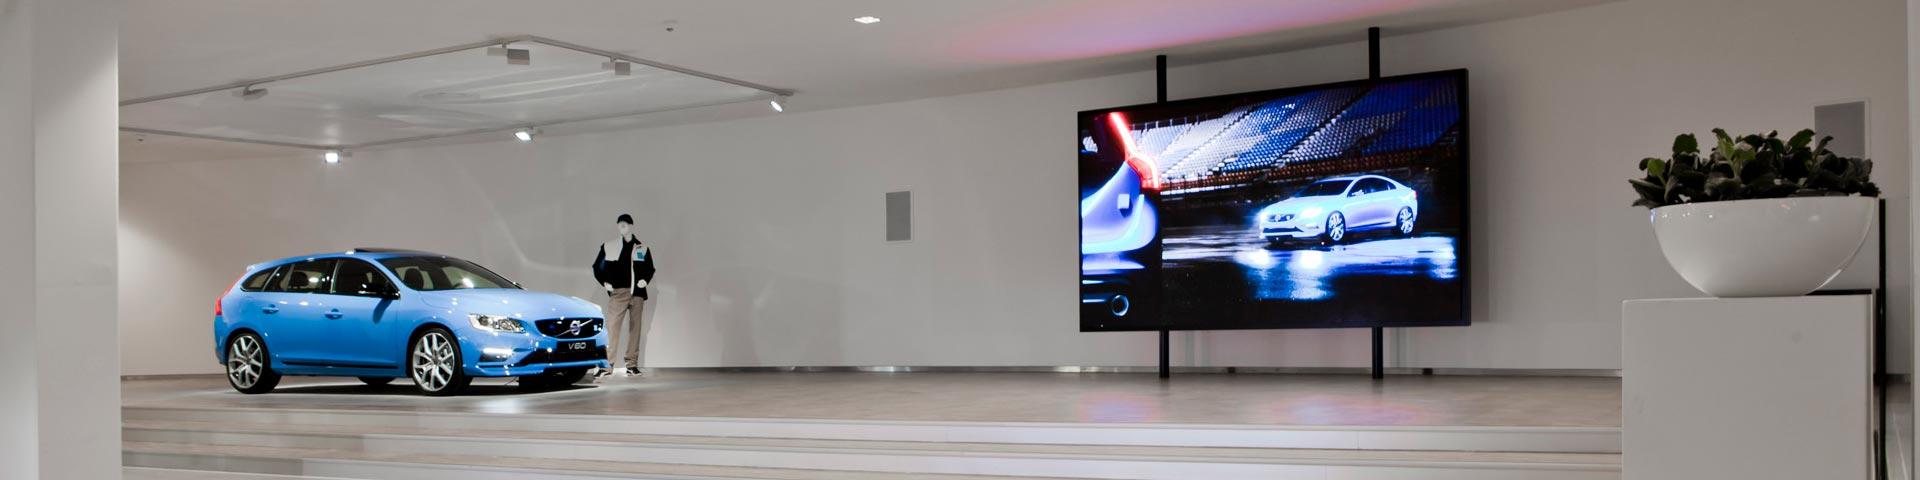 Volvo Bees indoor LED-display